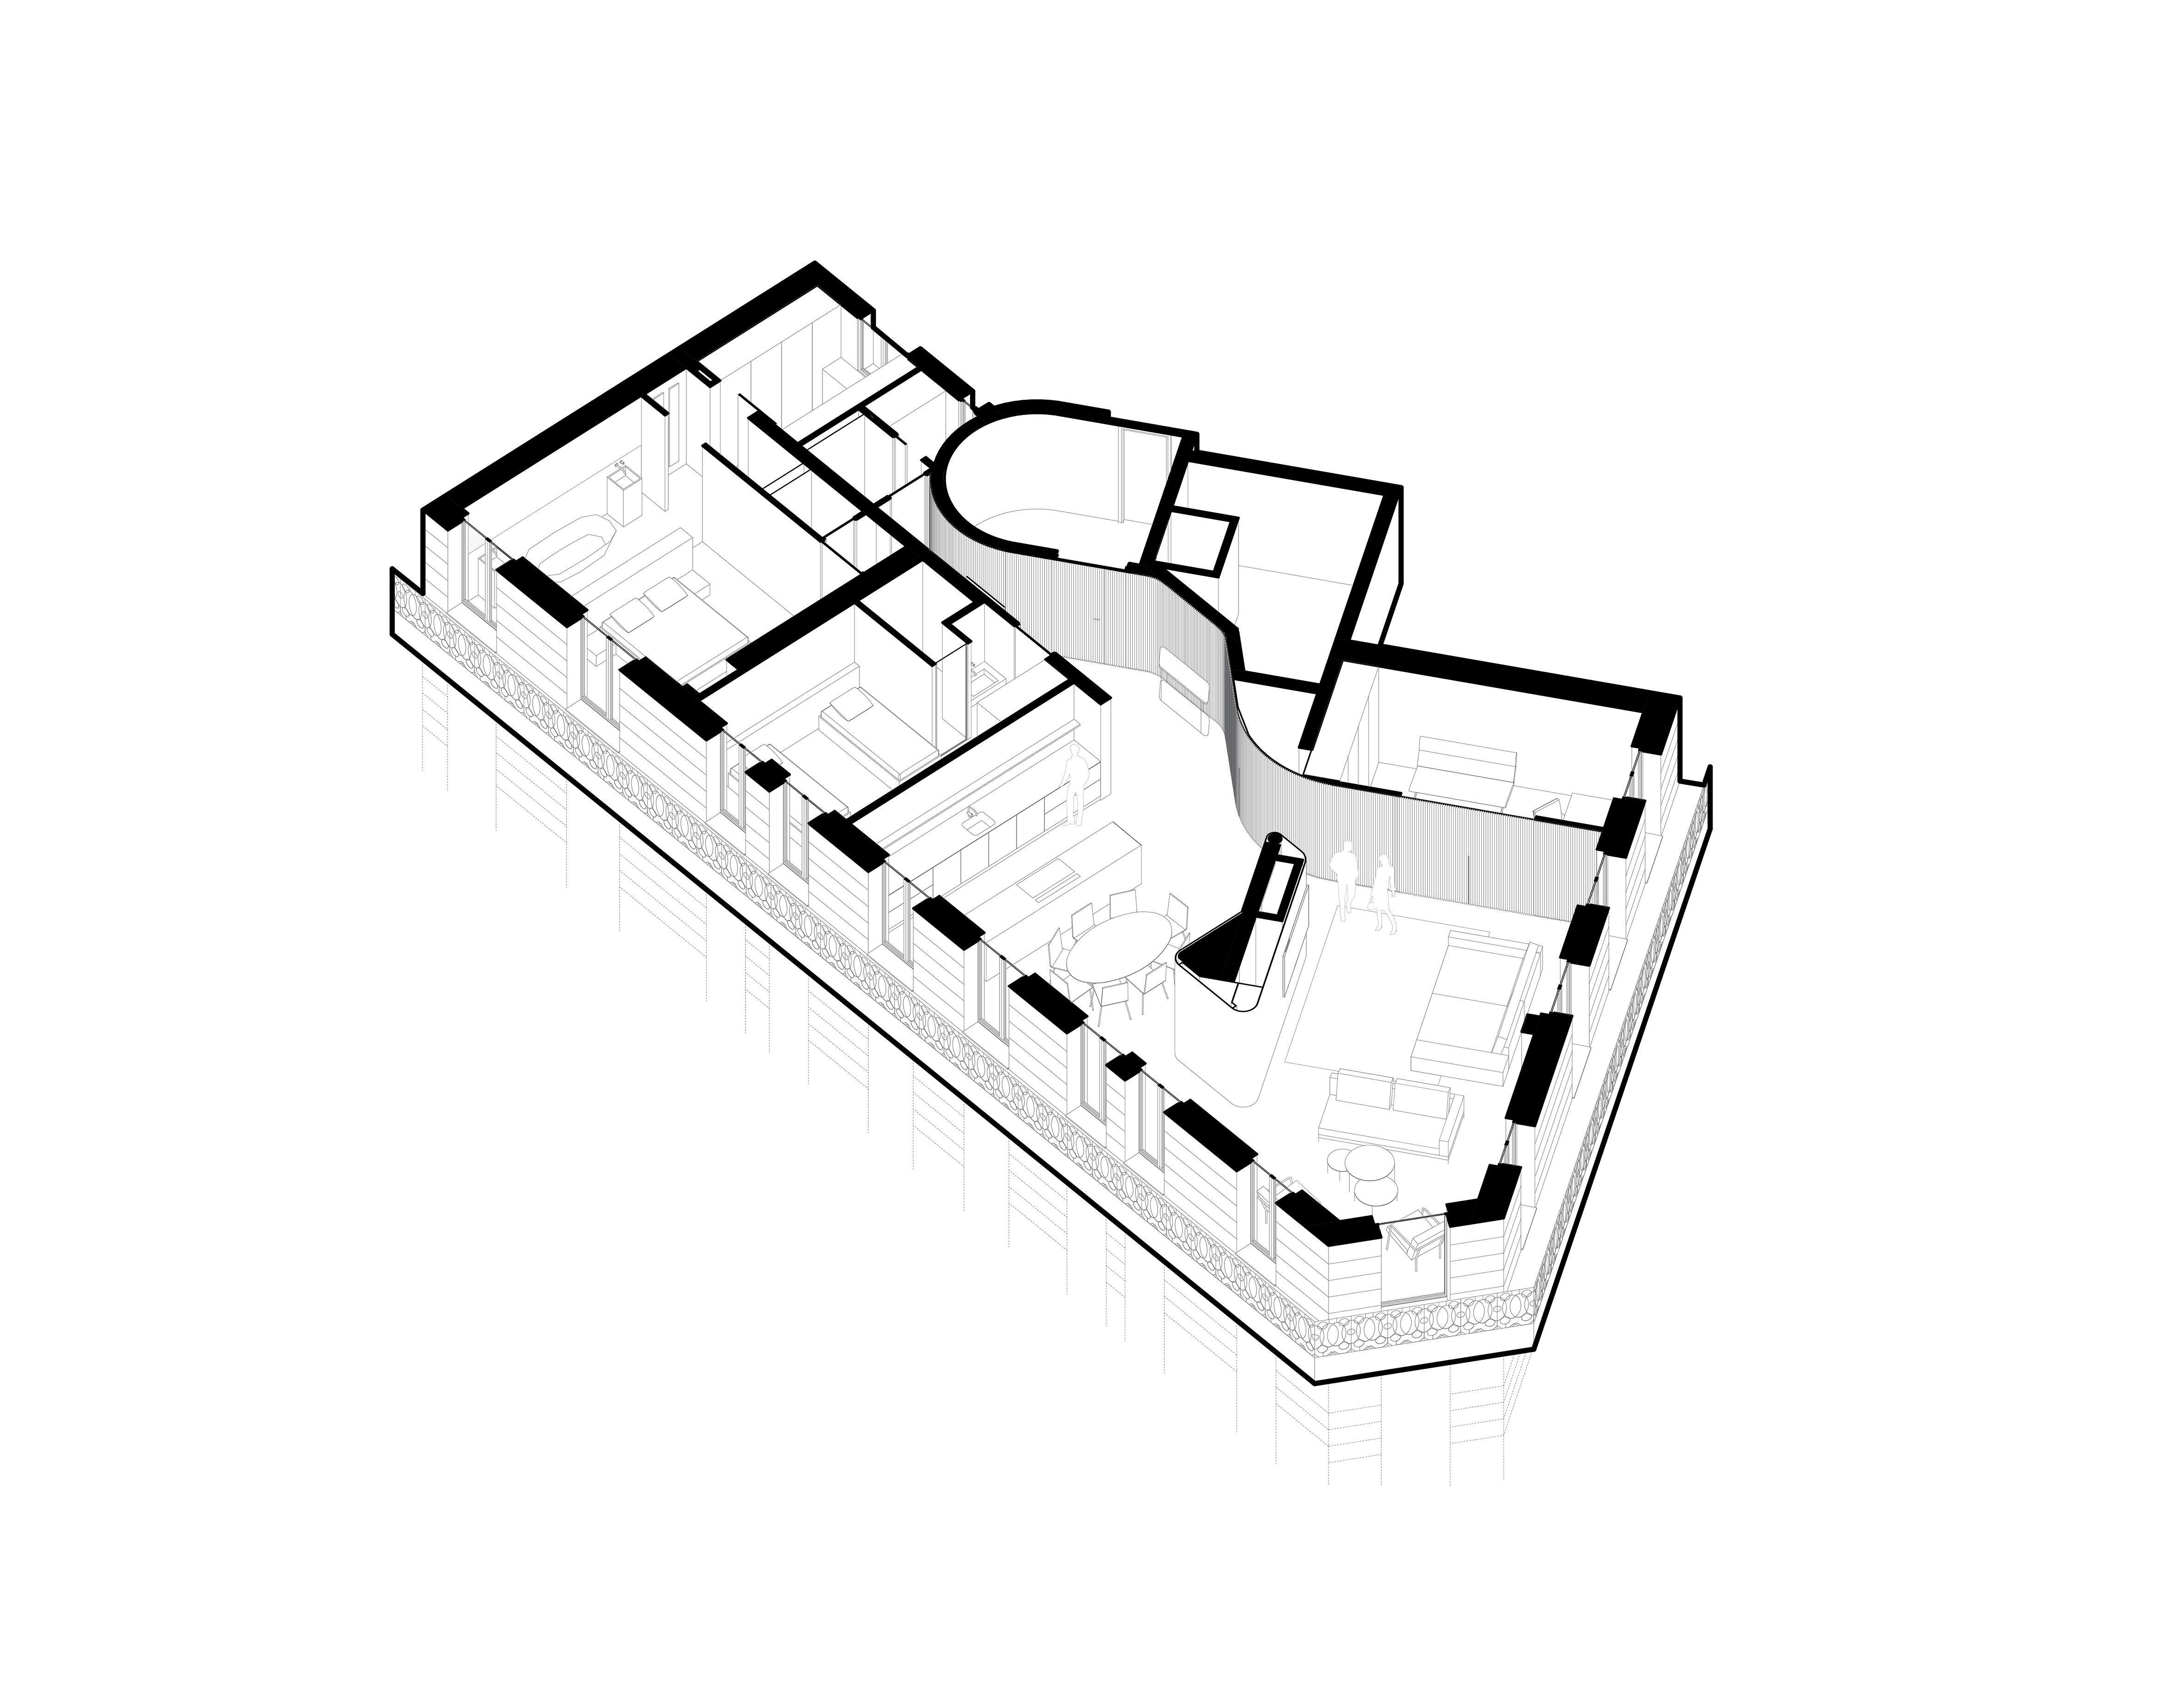 TRDN – Axonométrie